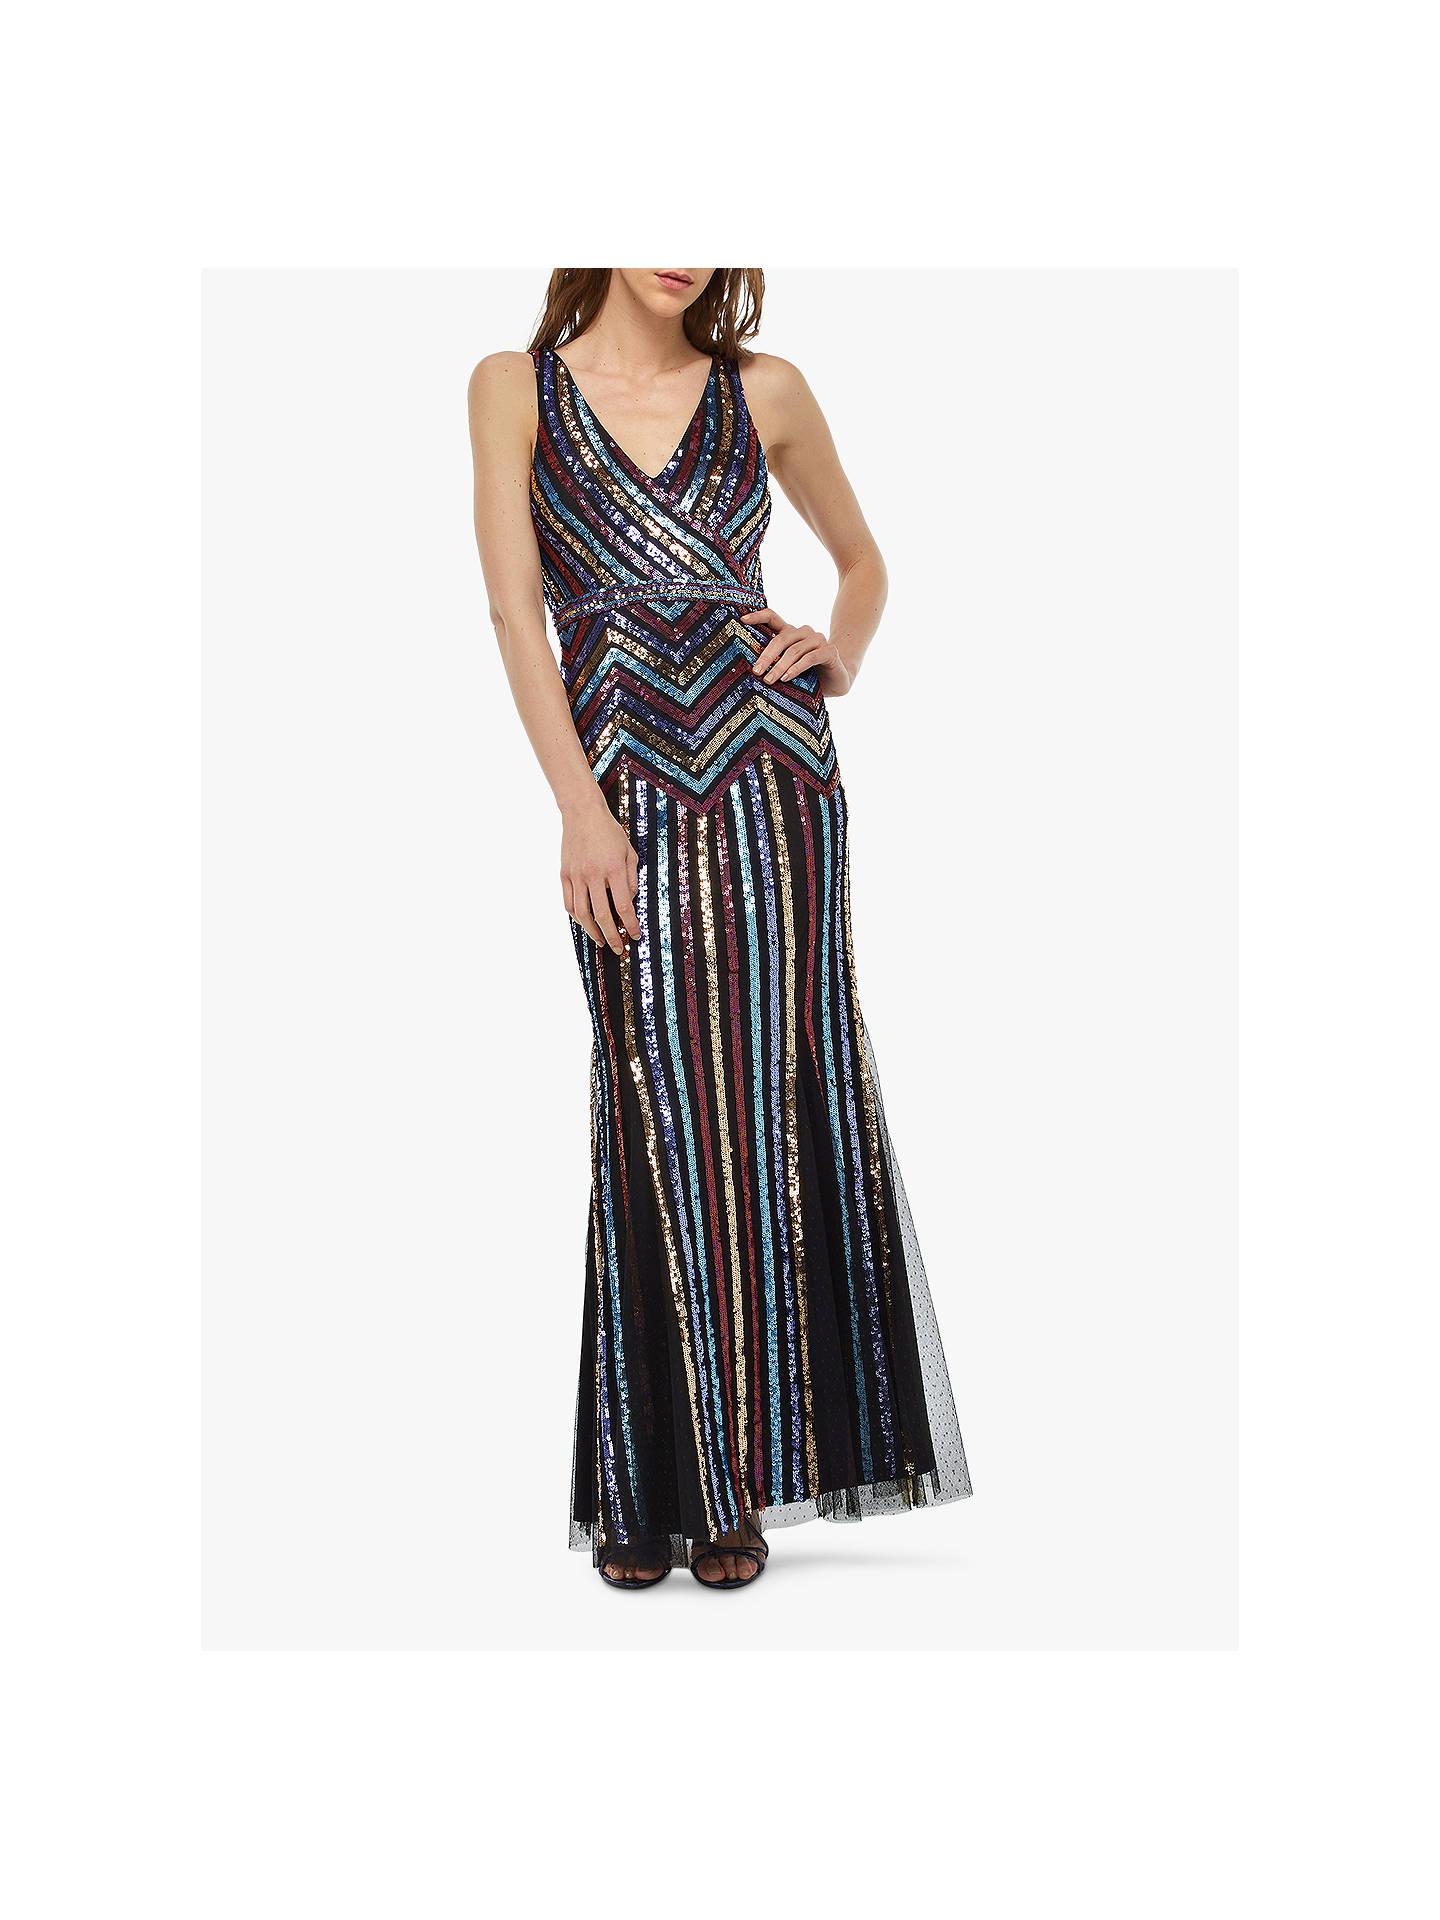 5f2cf1e68102c Monsoon Whitney Sequin Stripe Dress, Black at John Lewis & Partners